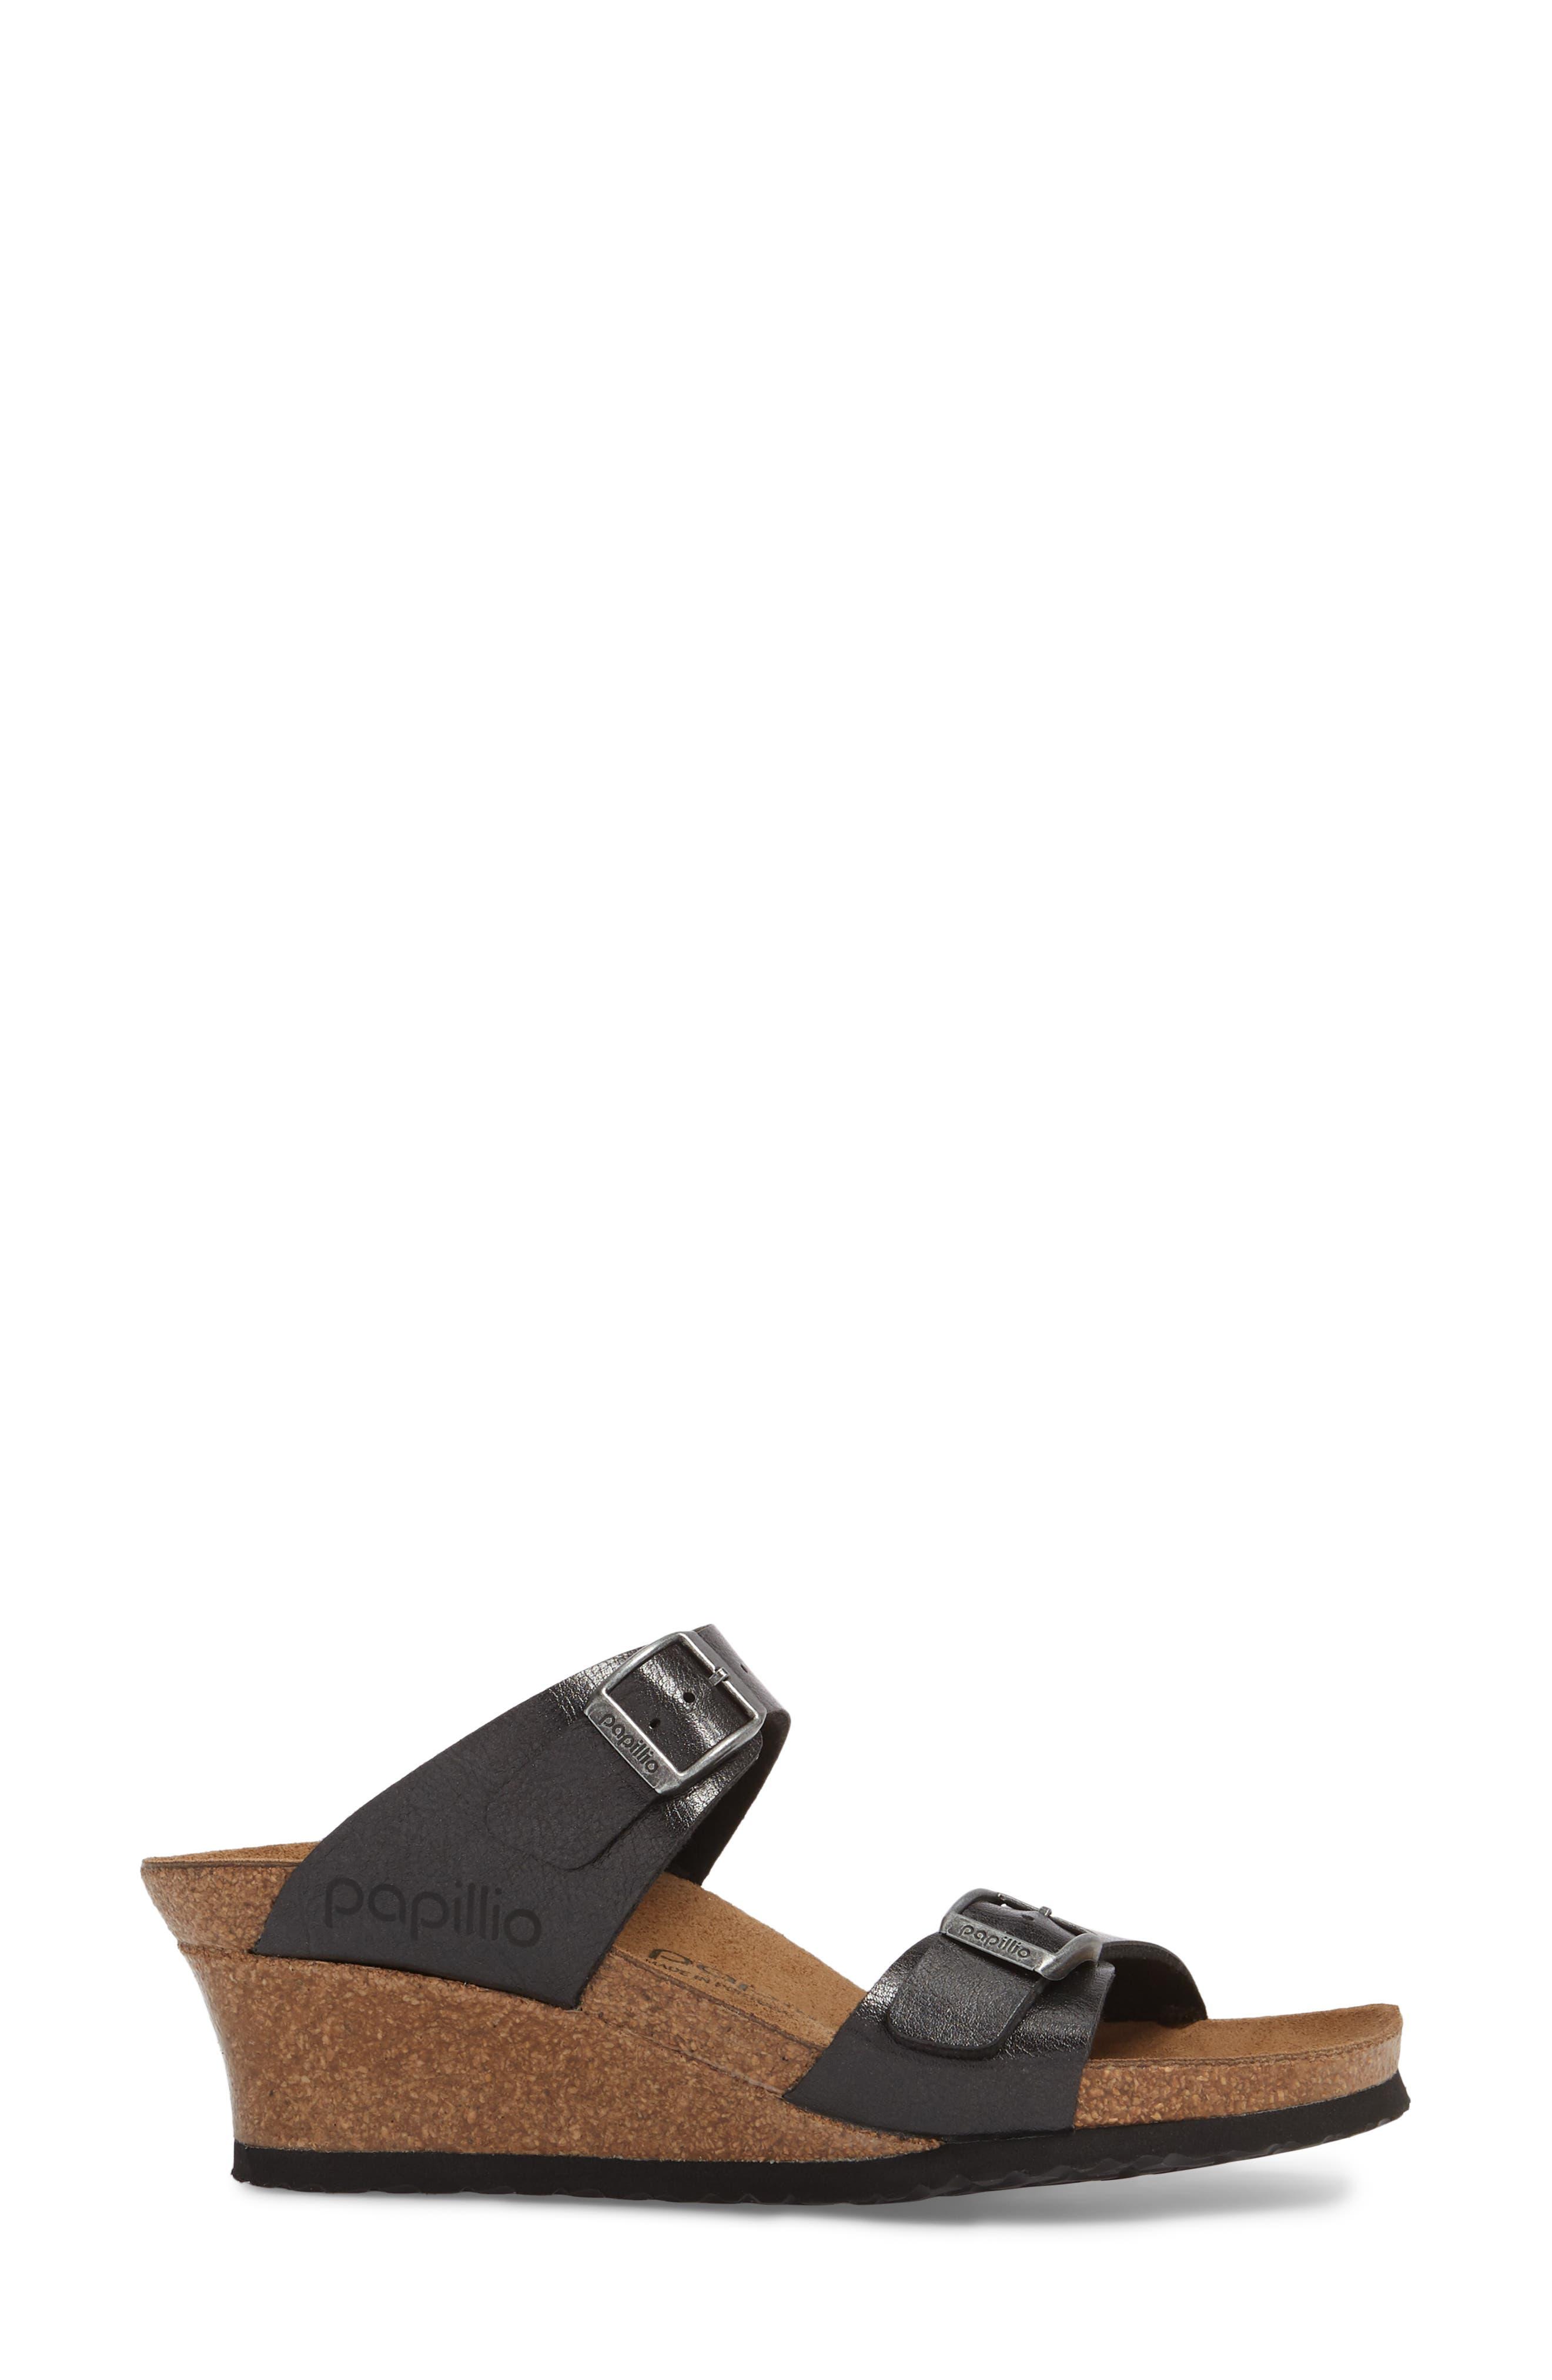 Papillio by Birkenstock Dorothy Wedge Slide Sandal,                             Alternate thumbnail 3, color,                             Graceful Licorice Leather